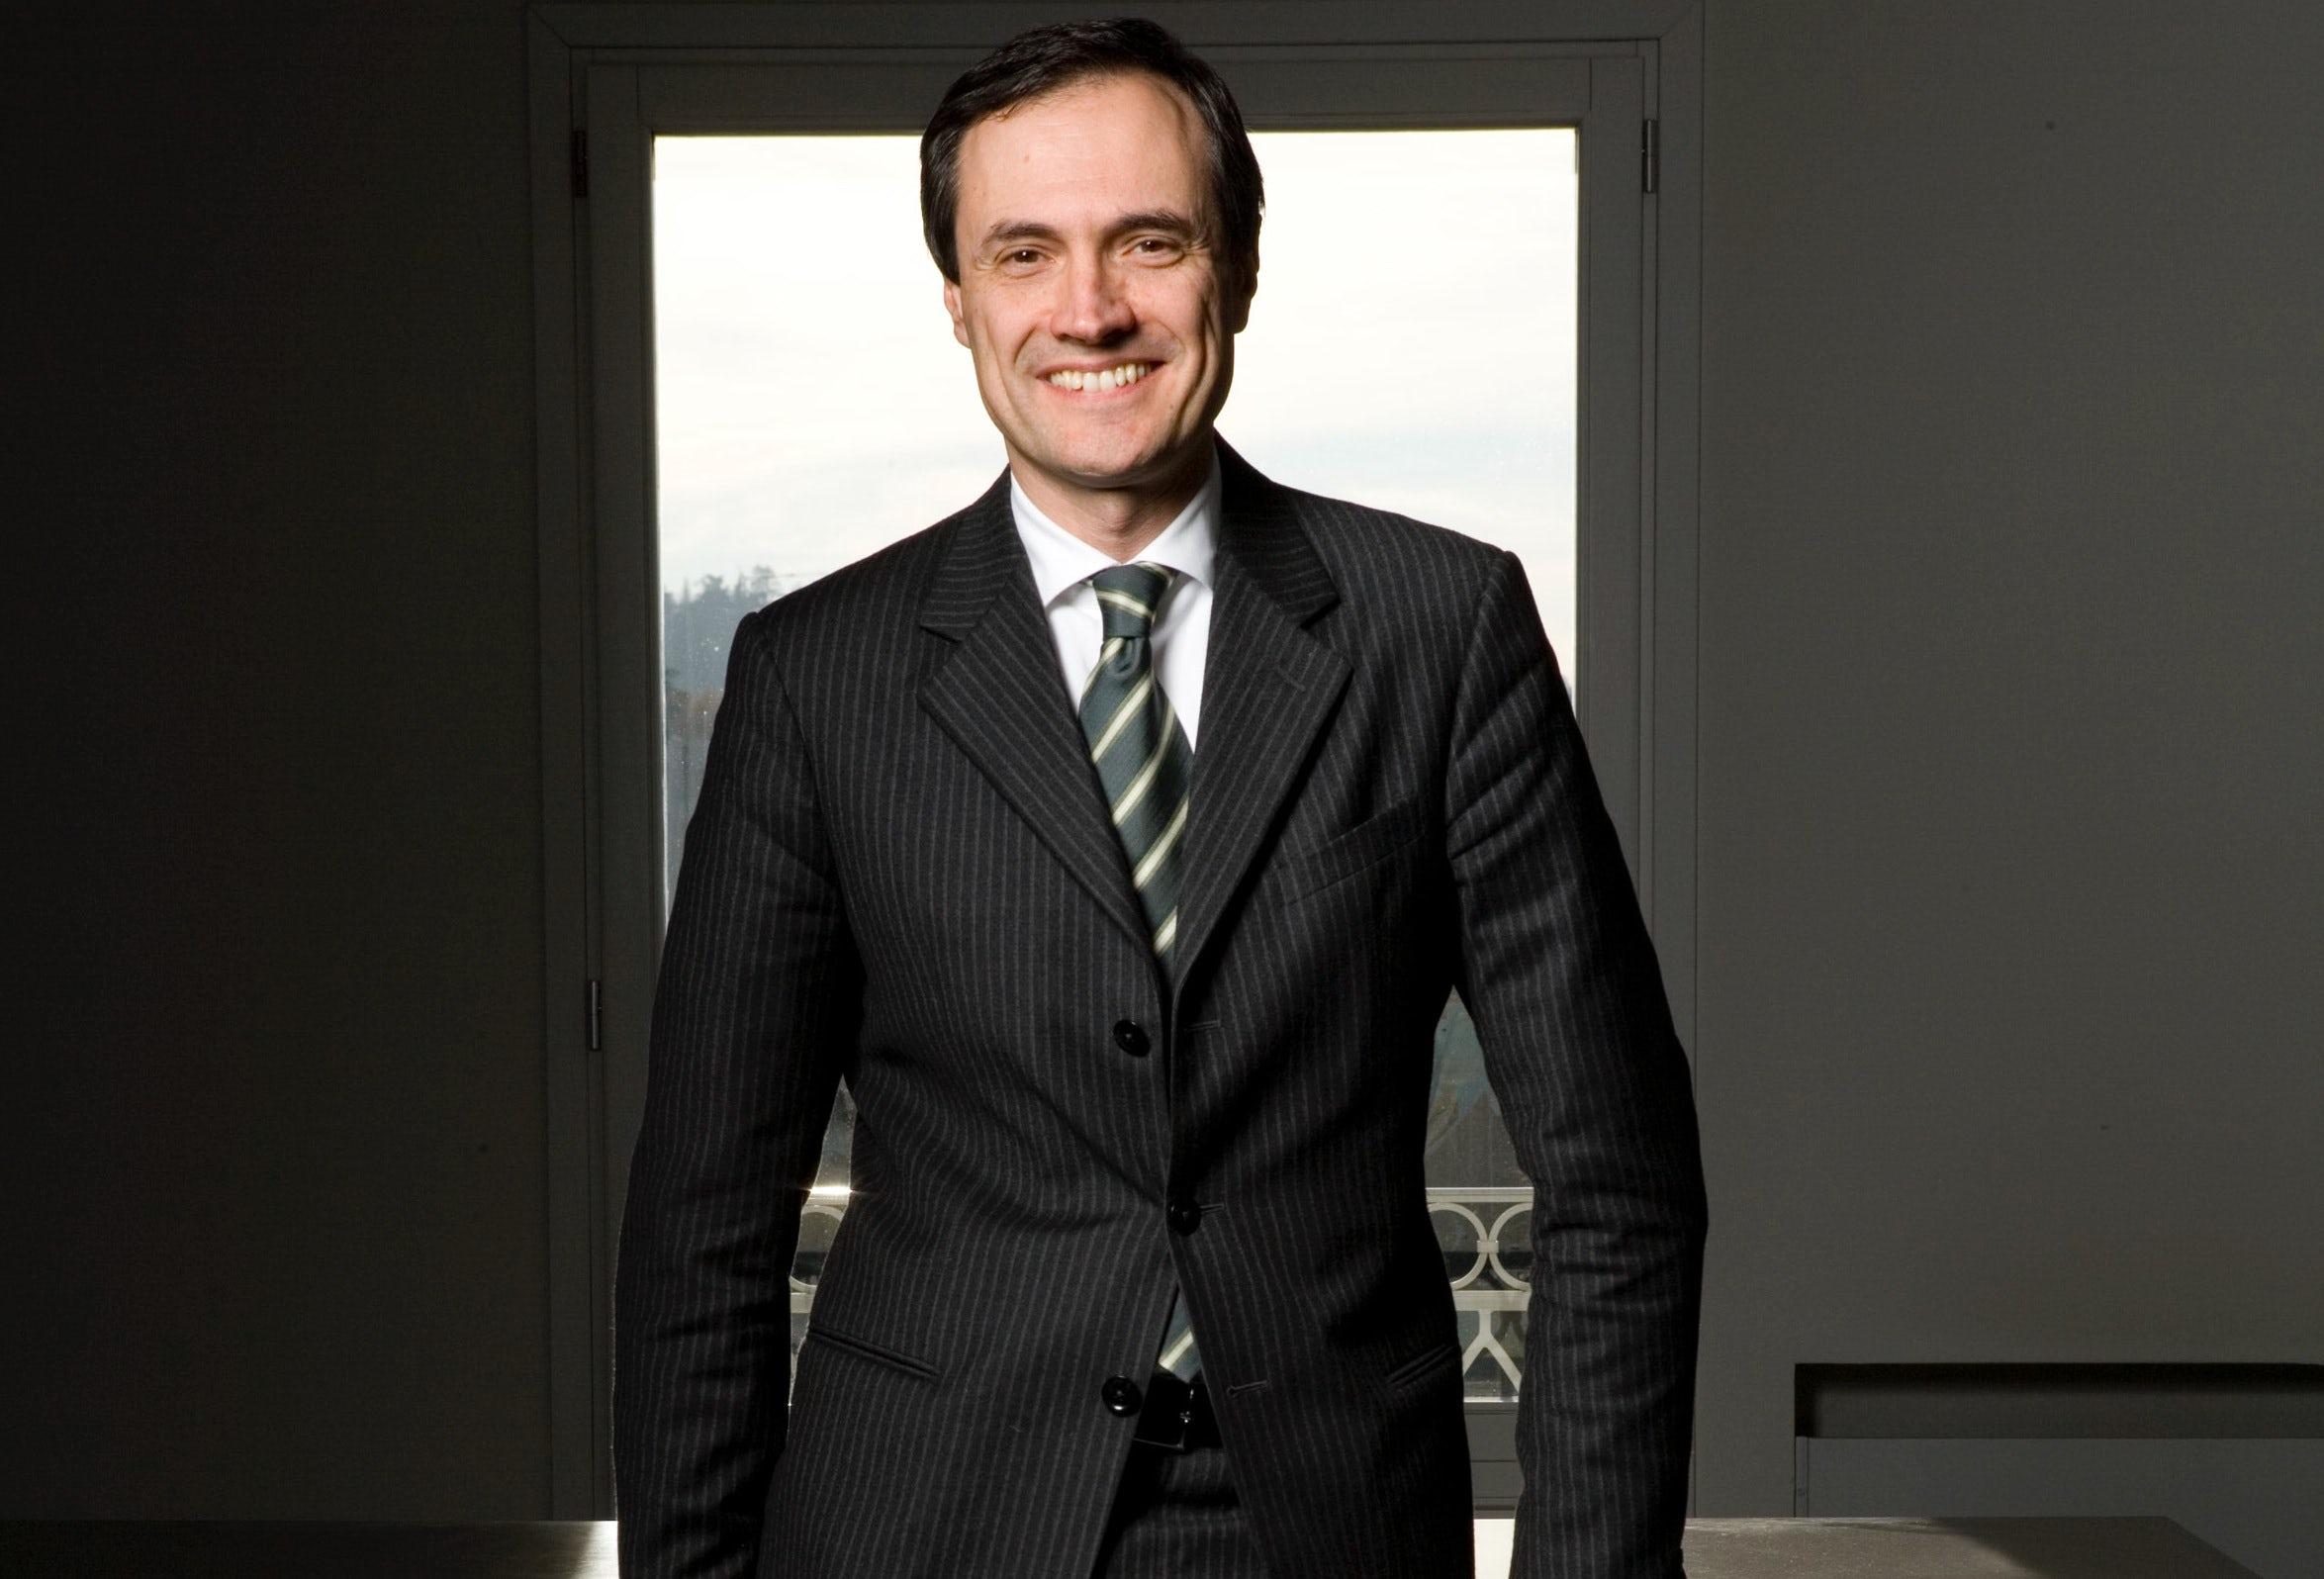 Paolo Fontanelli, CEO of Furla